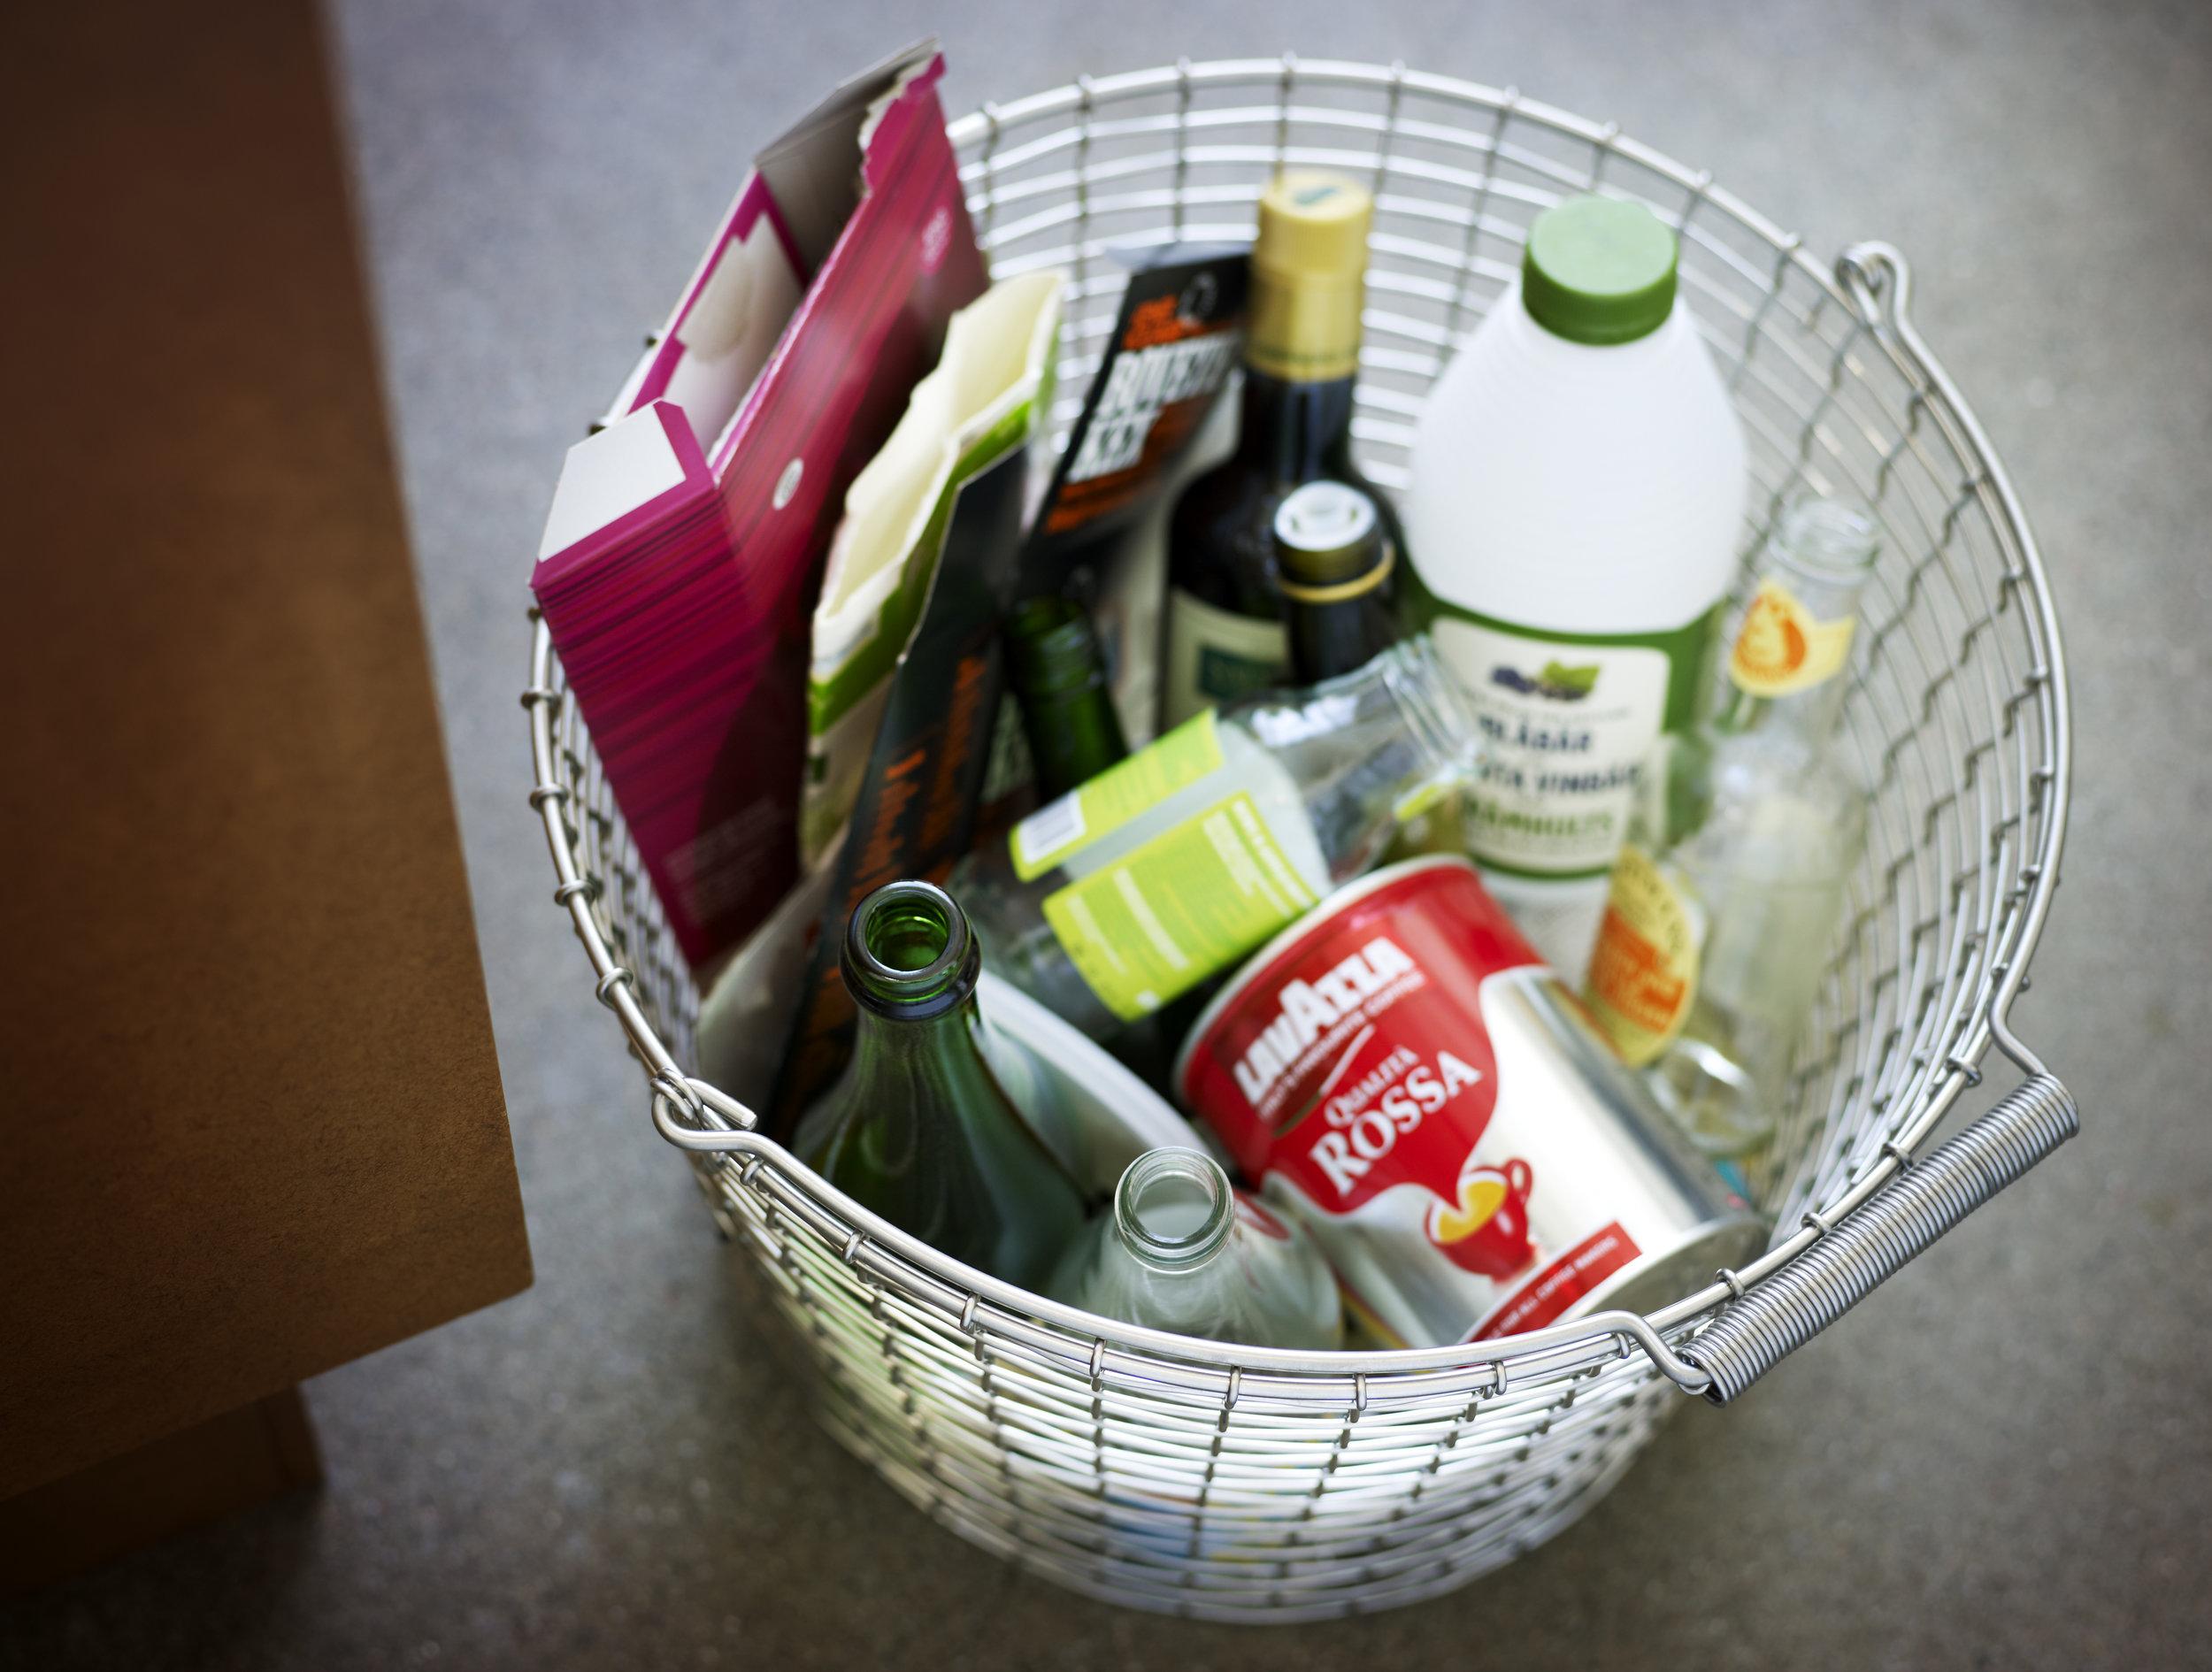 Korbo bucket recycling